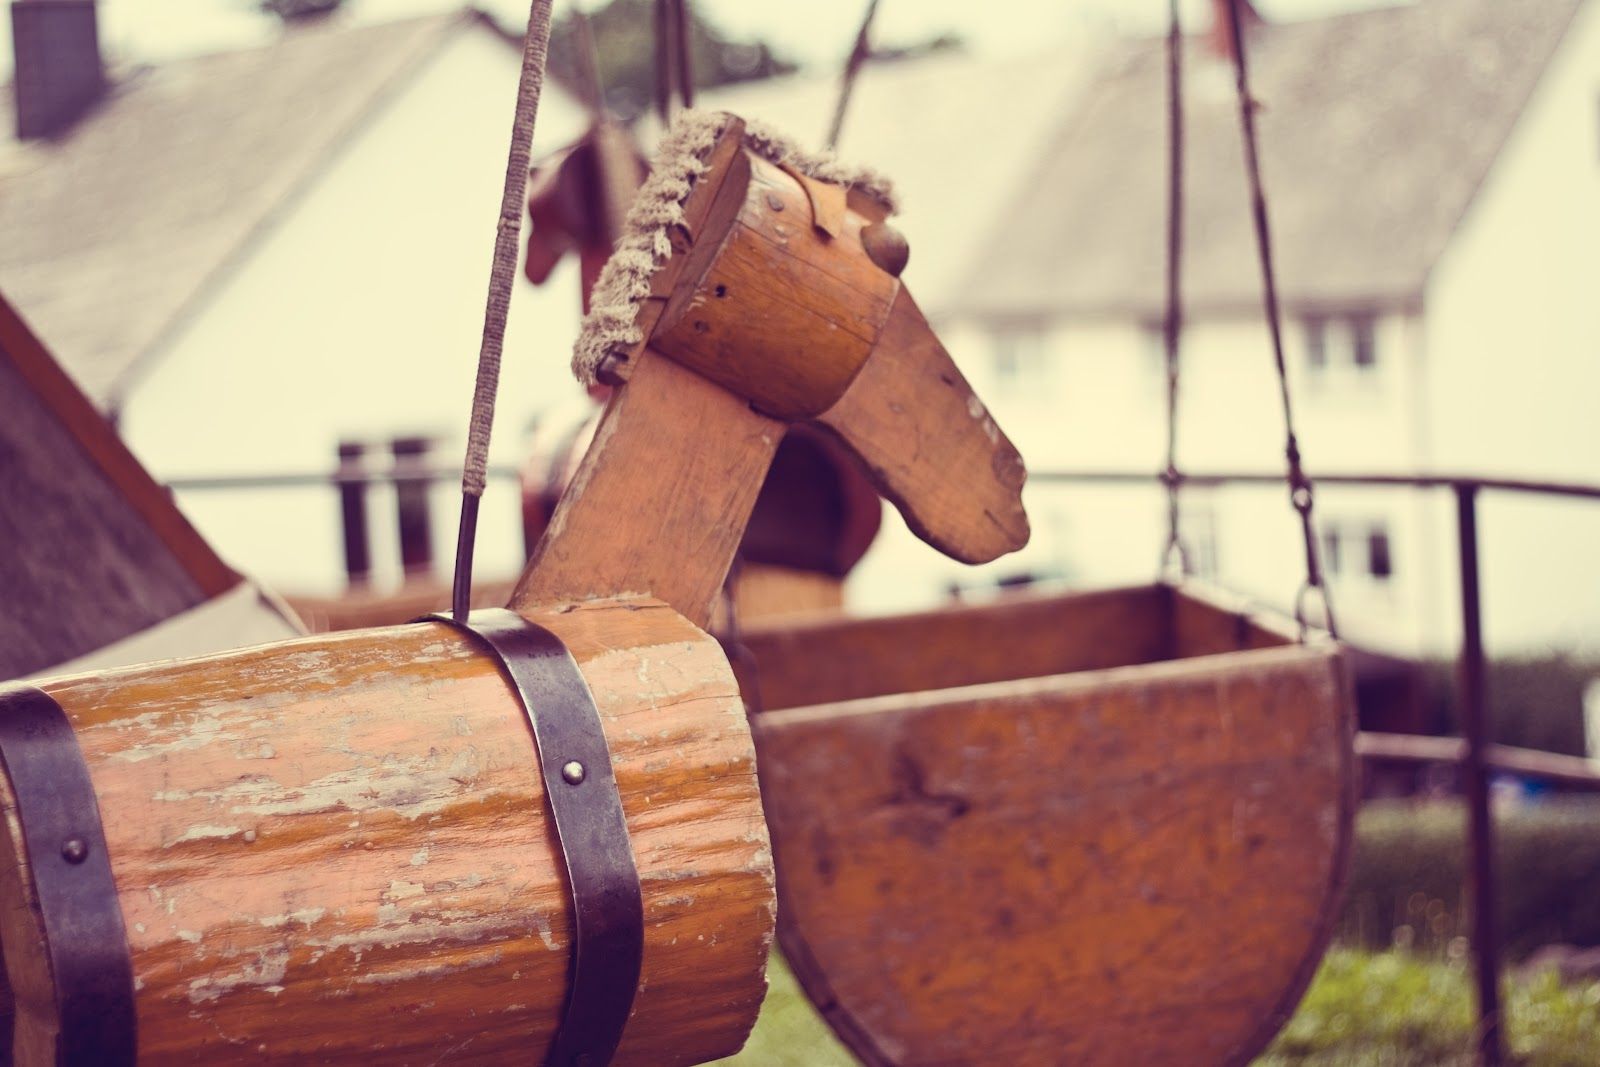 http://4.bp.blogspot.com/-WB0fgyYq45w/UA5oToVJJJI/AAAAAAAAE78/8vaRakBusvM/s1600/Medieval+Merry+Go+Round.jpg